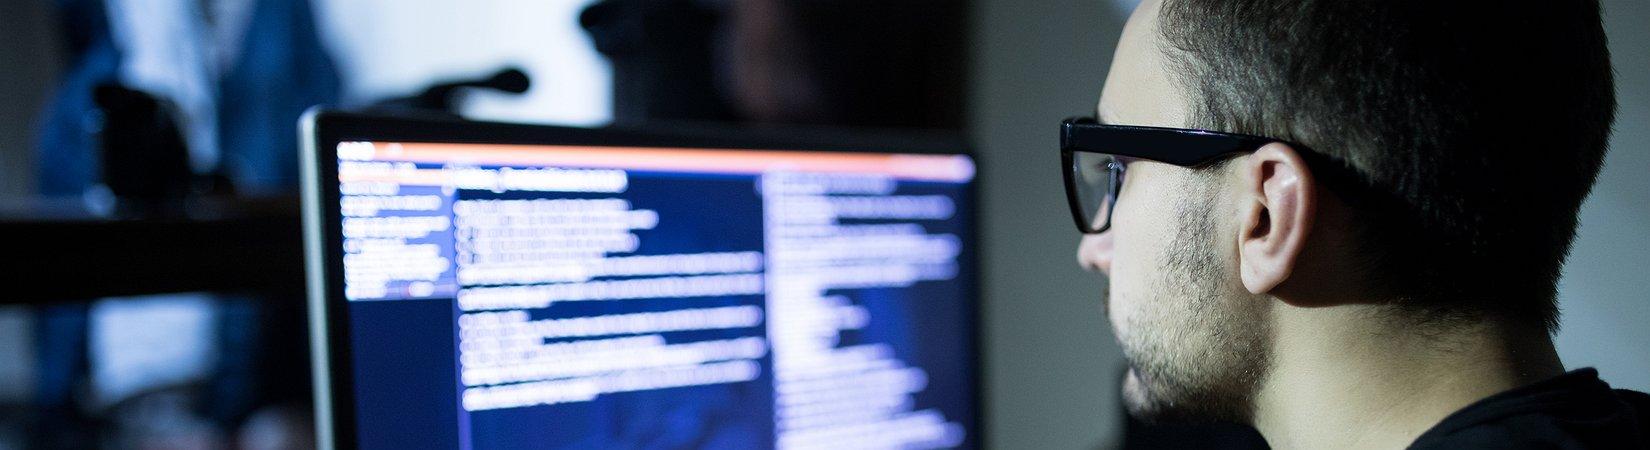 Ciberataque masivo a 150 países